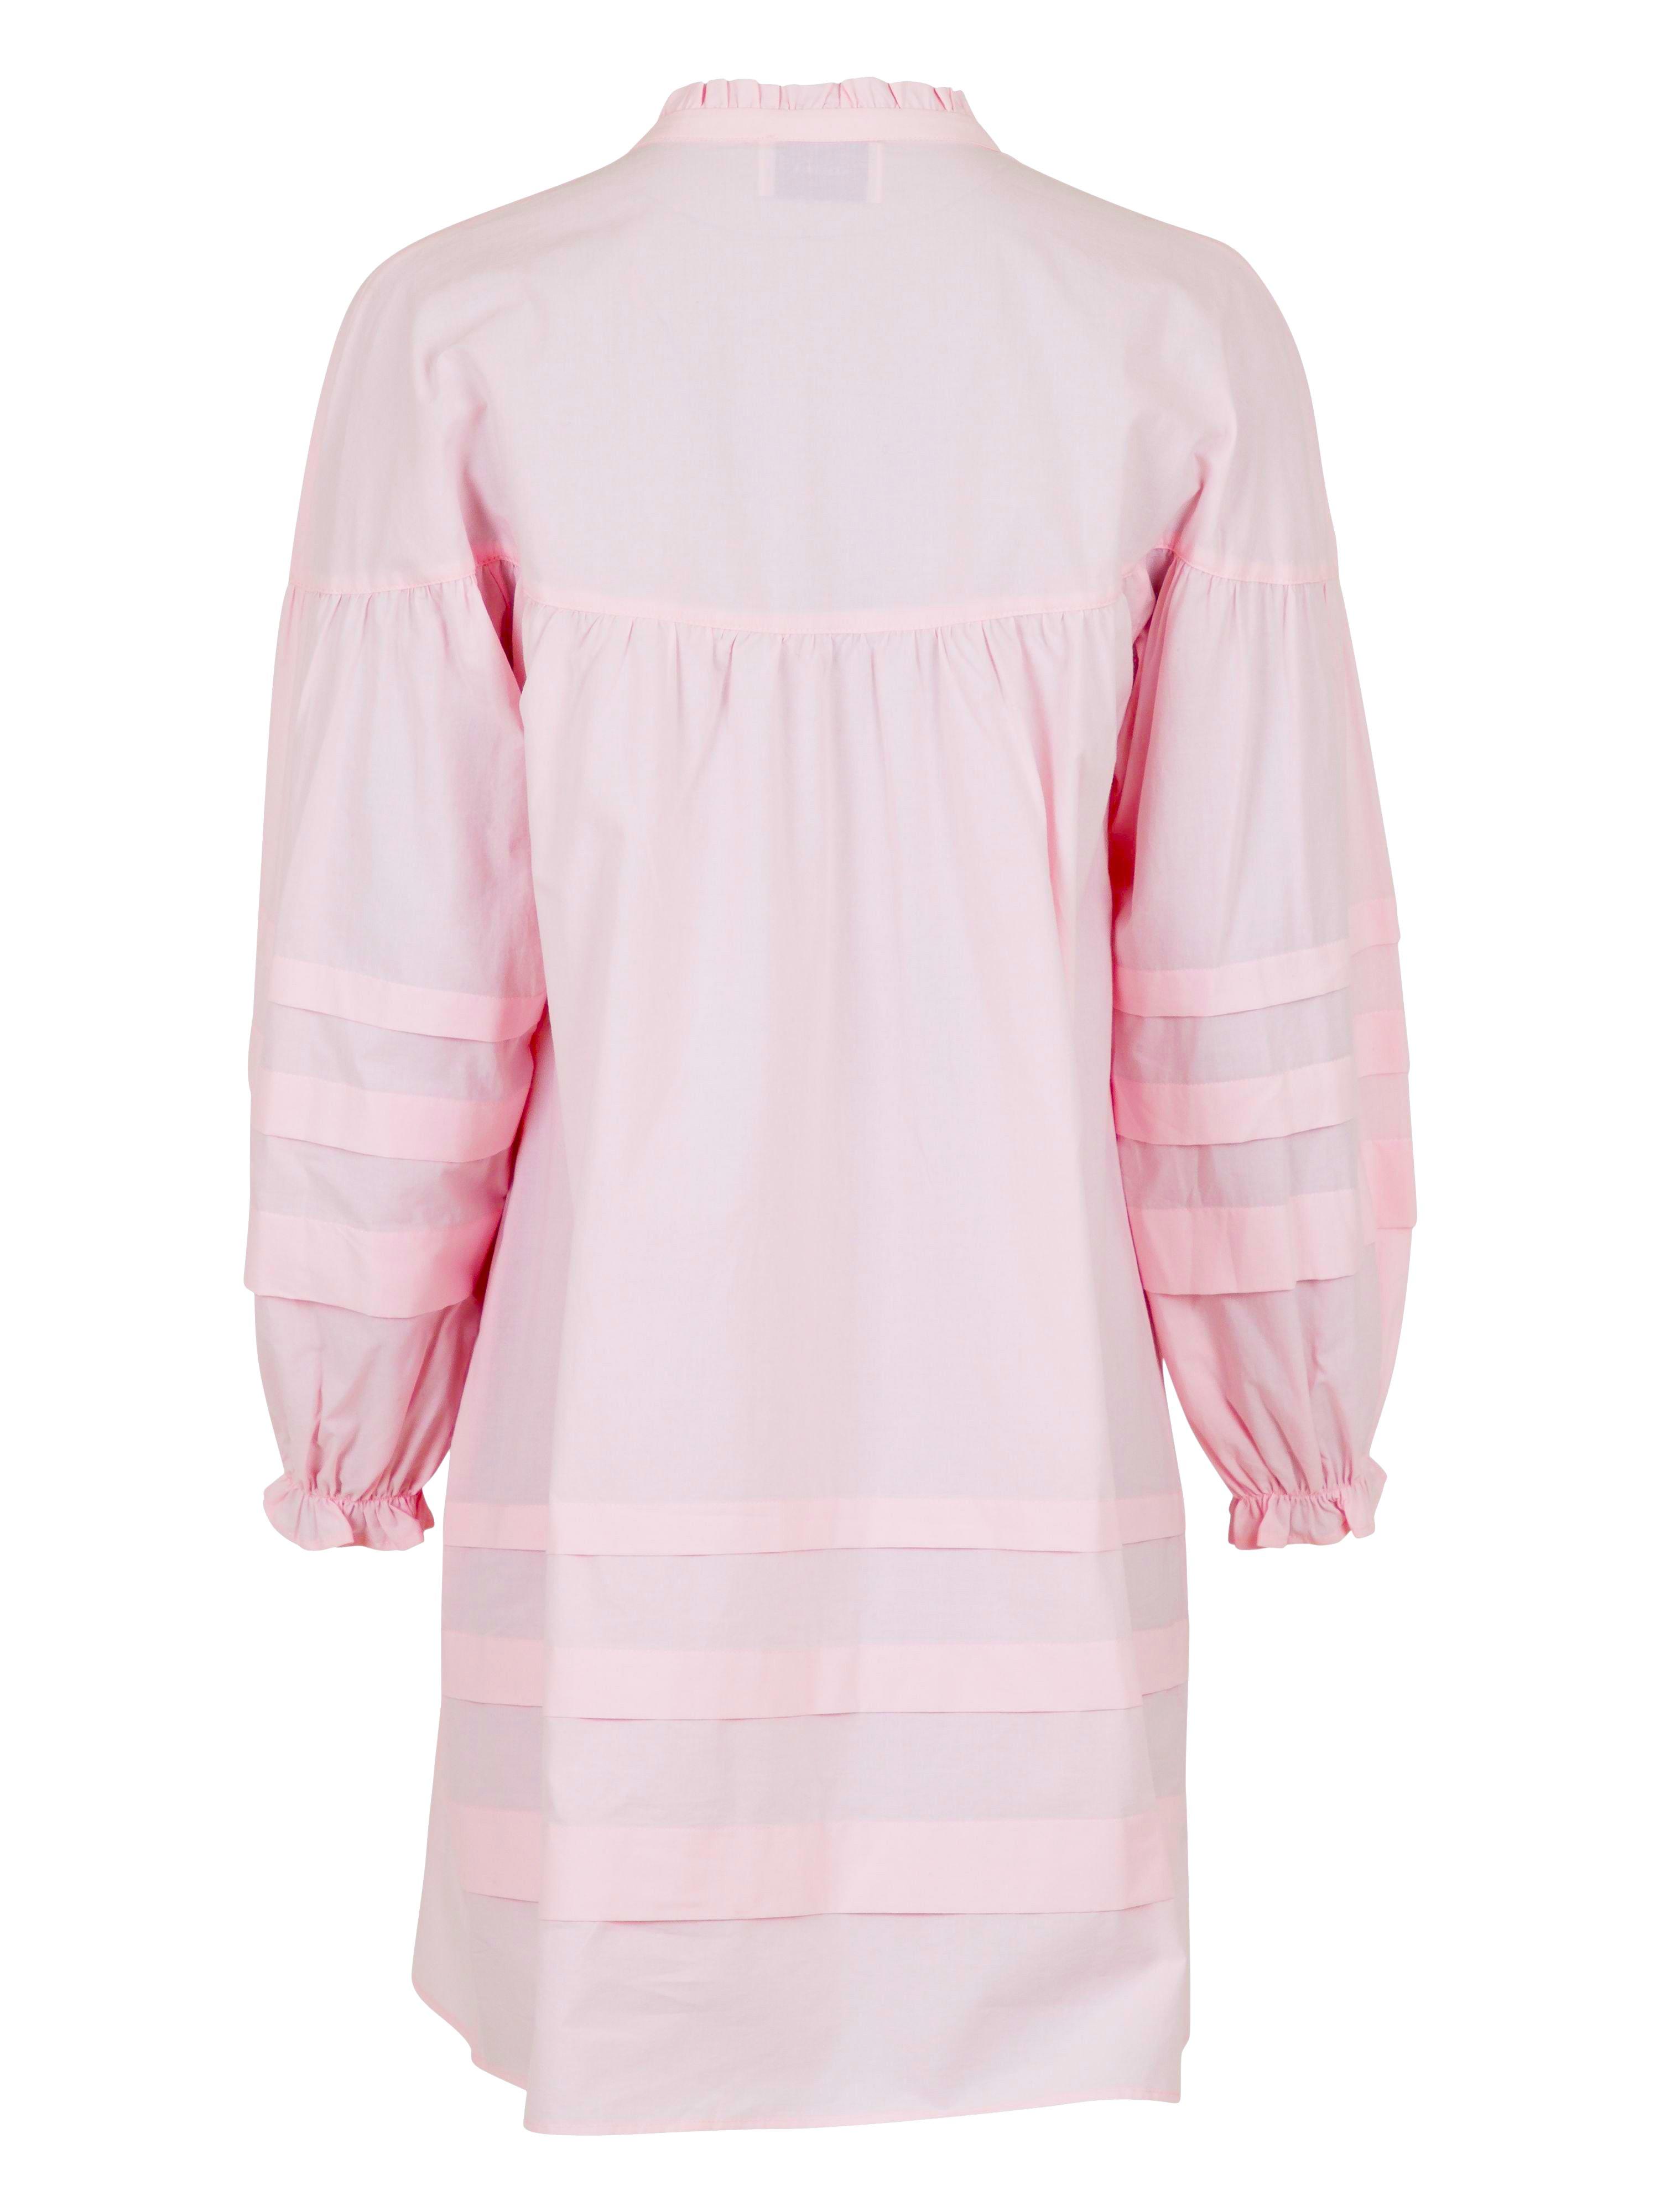 Neo Noir Holly kjole, Light Pink, 38